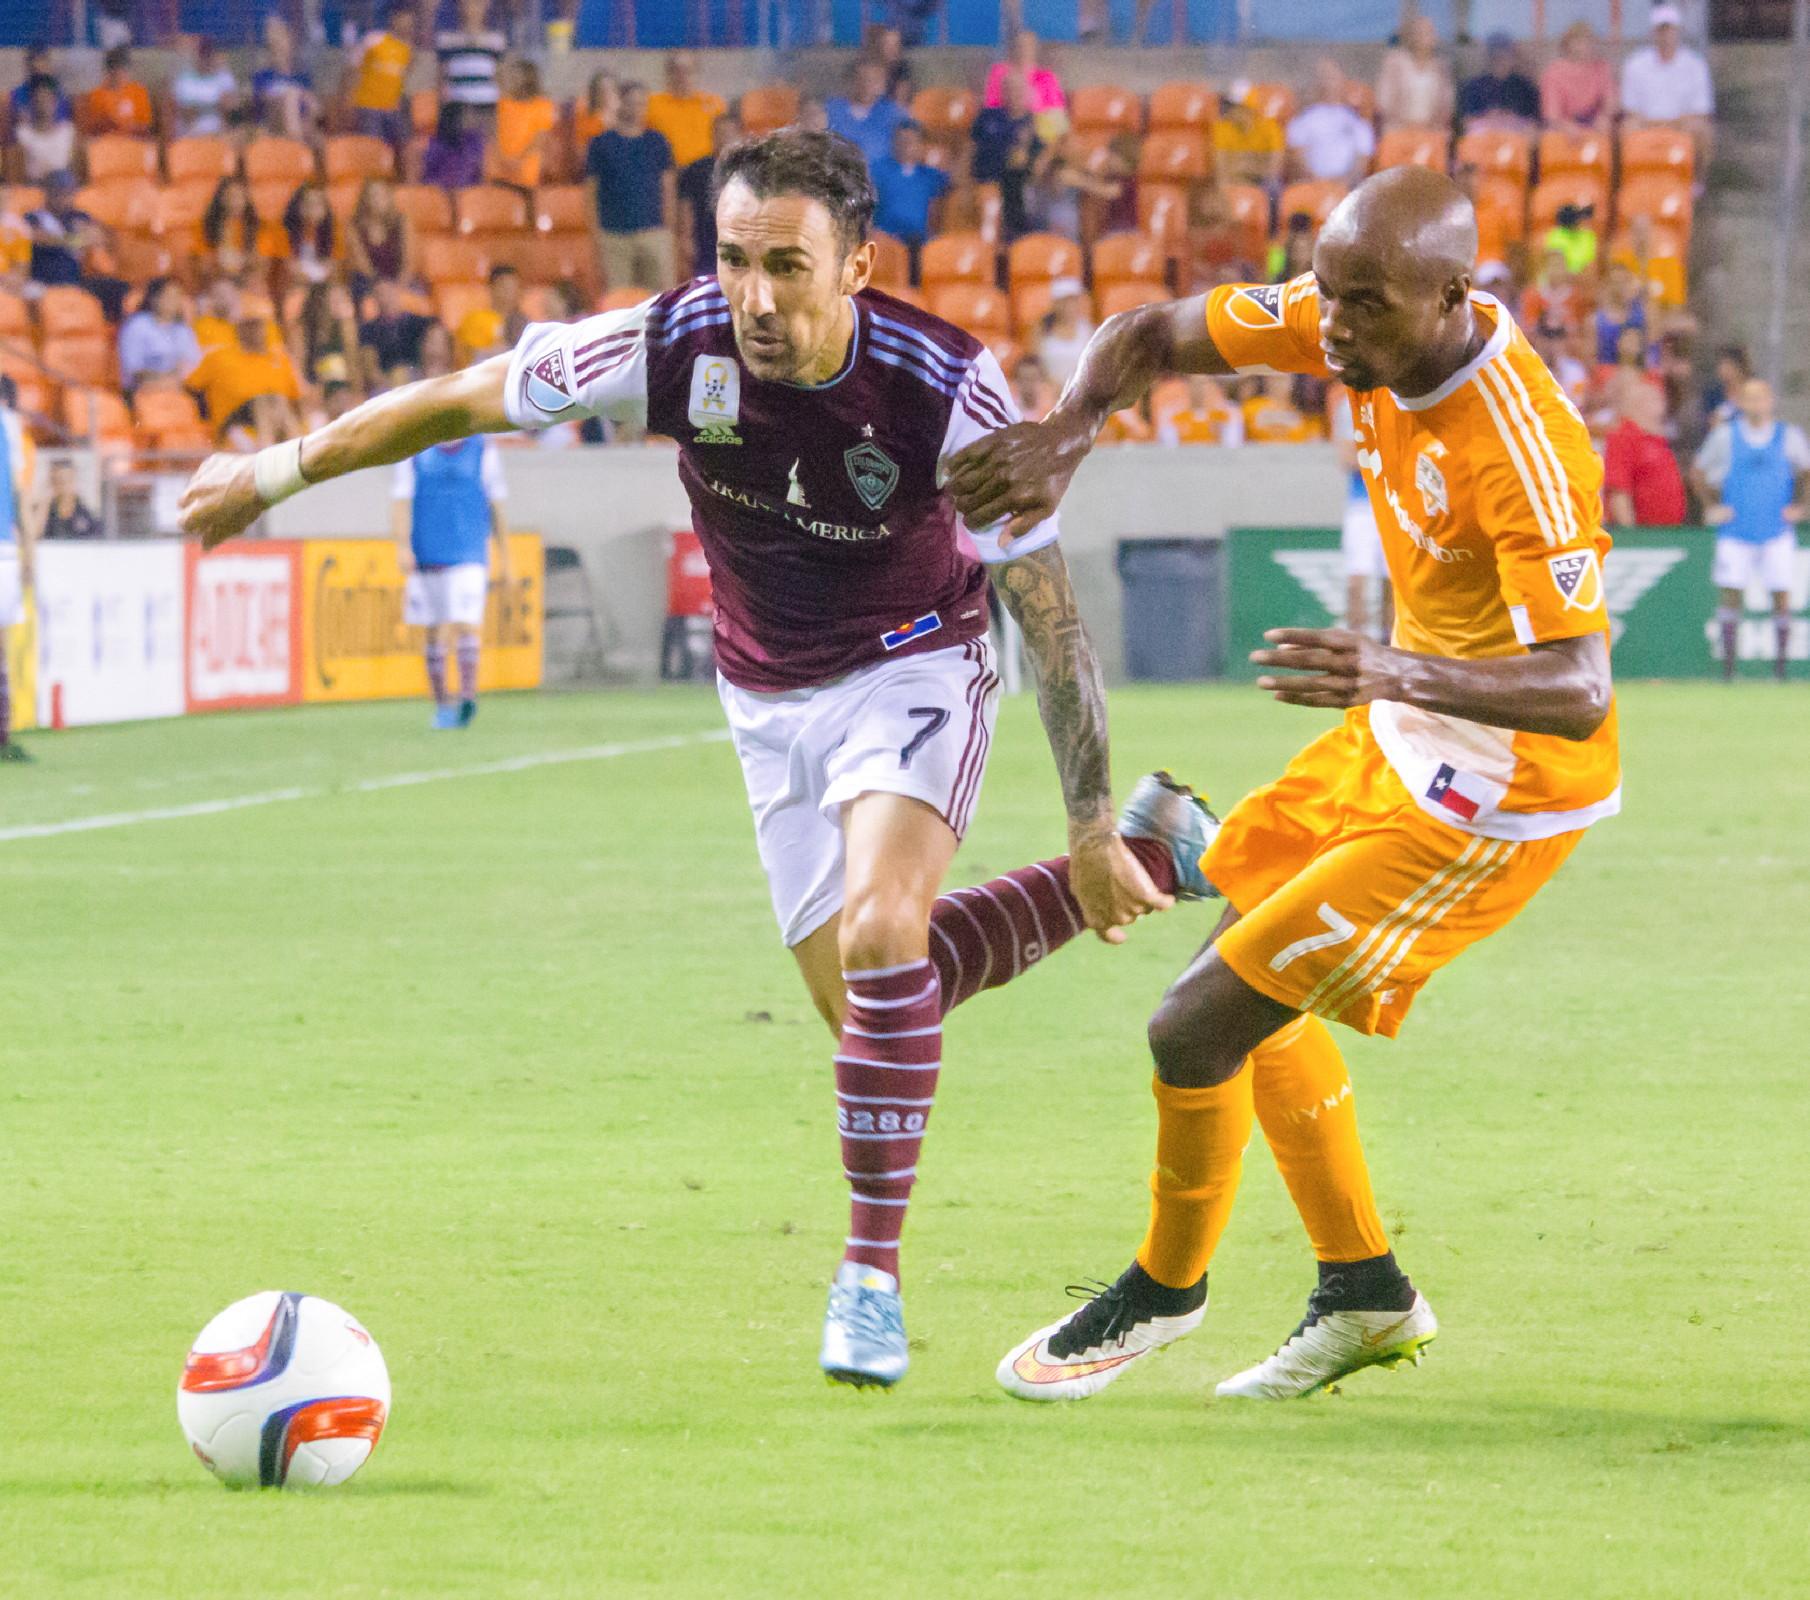 Dynamo: Dynamo Soccer: Houston Dynamo Vs Colorado Rapids (Photo